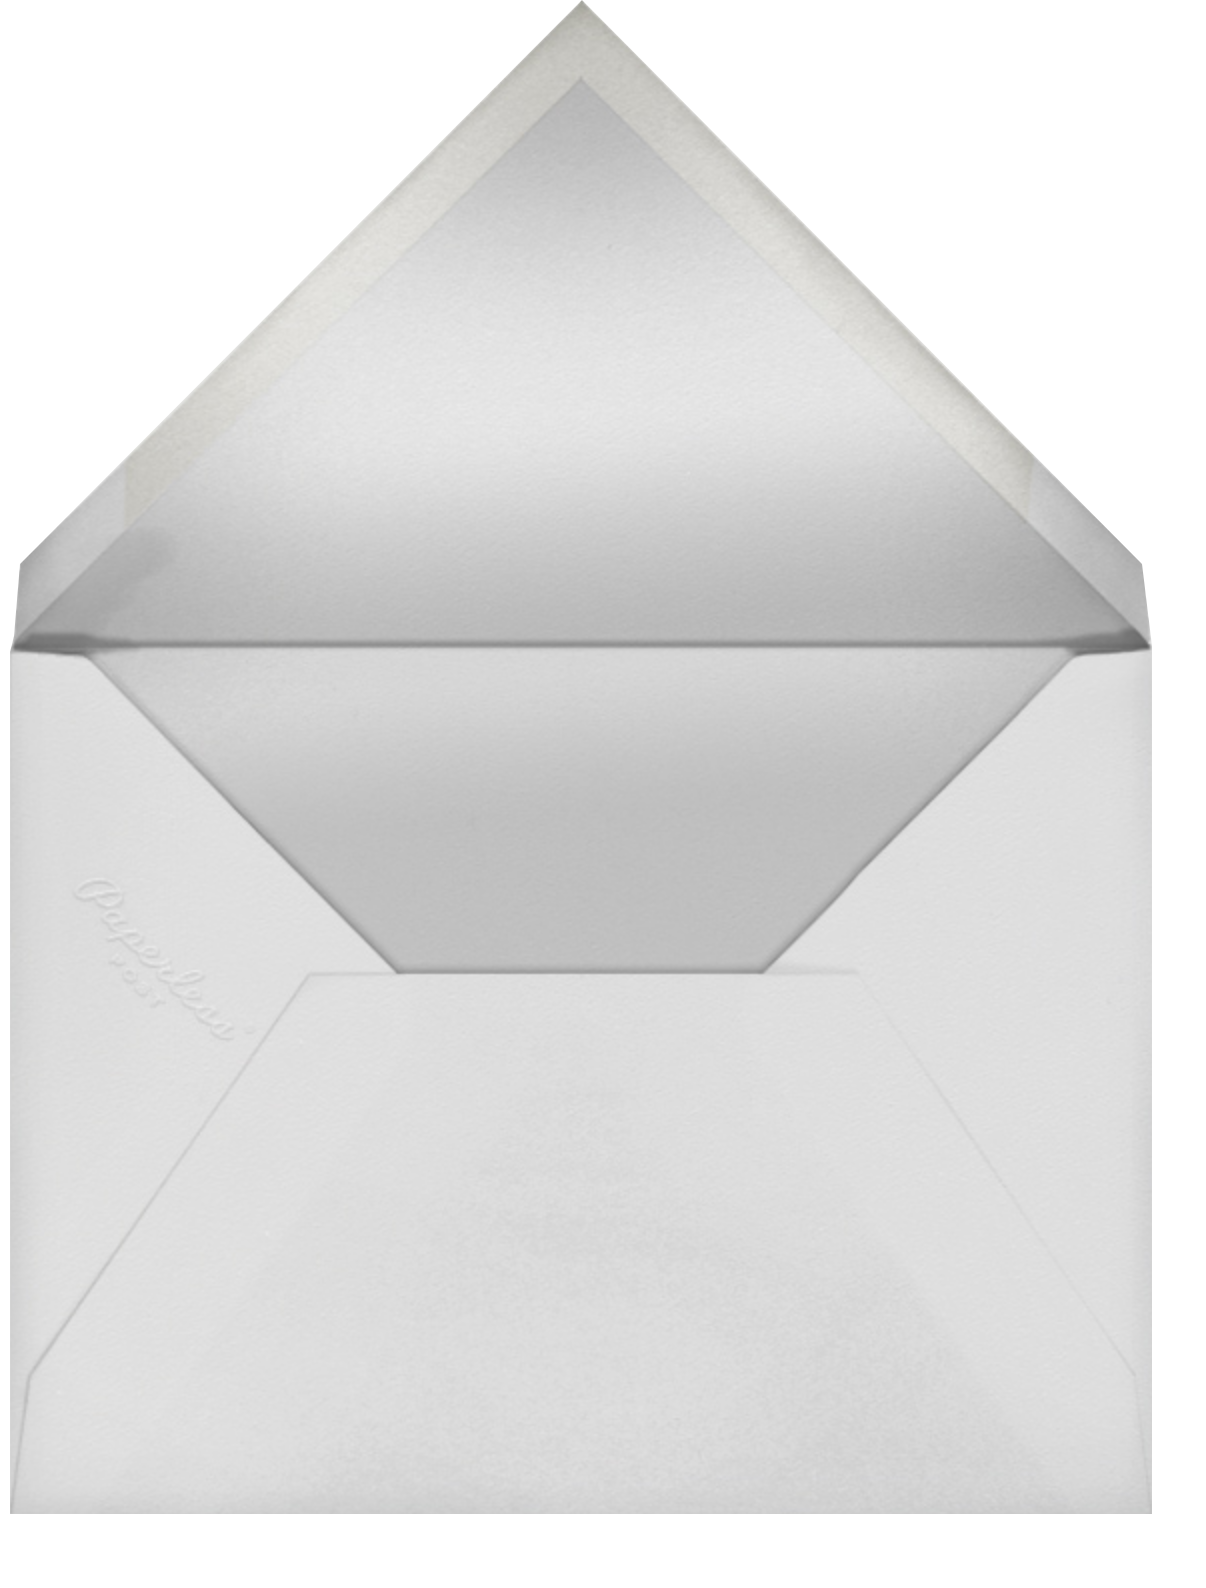 Lapis Lazuli (Tall) - Paperless Post - Hanukkah - envelope back